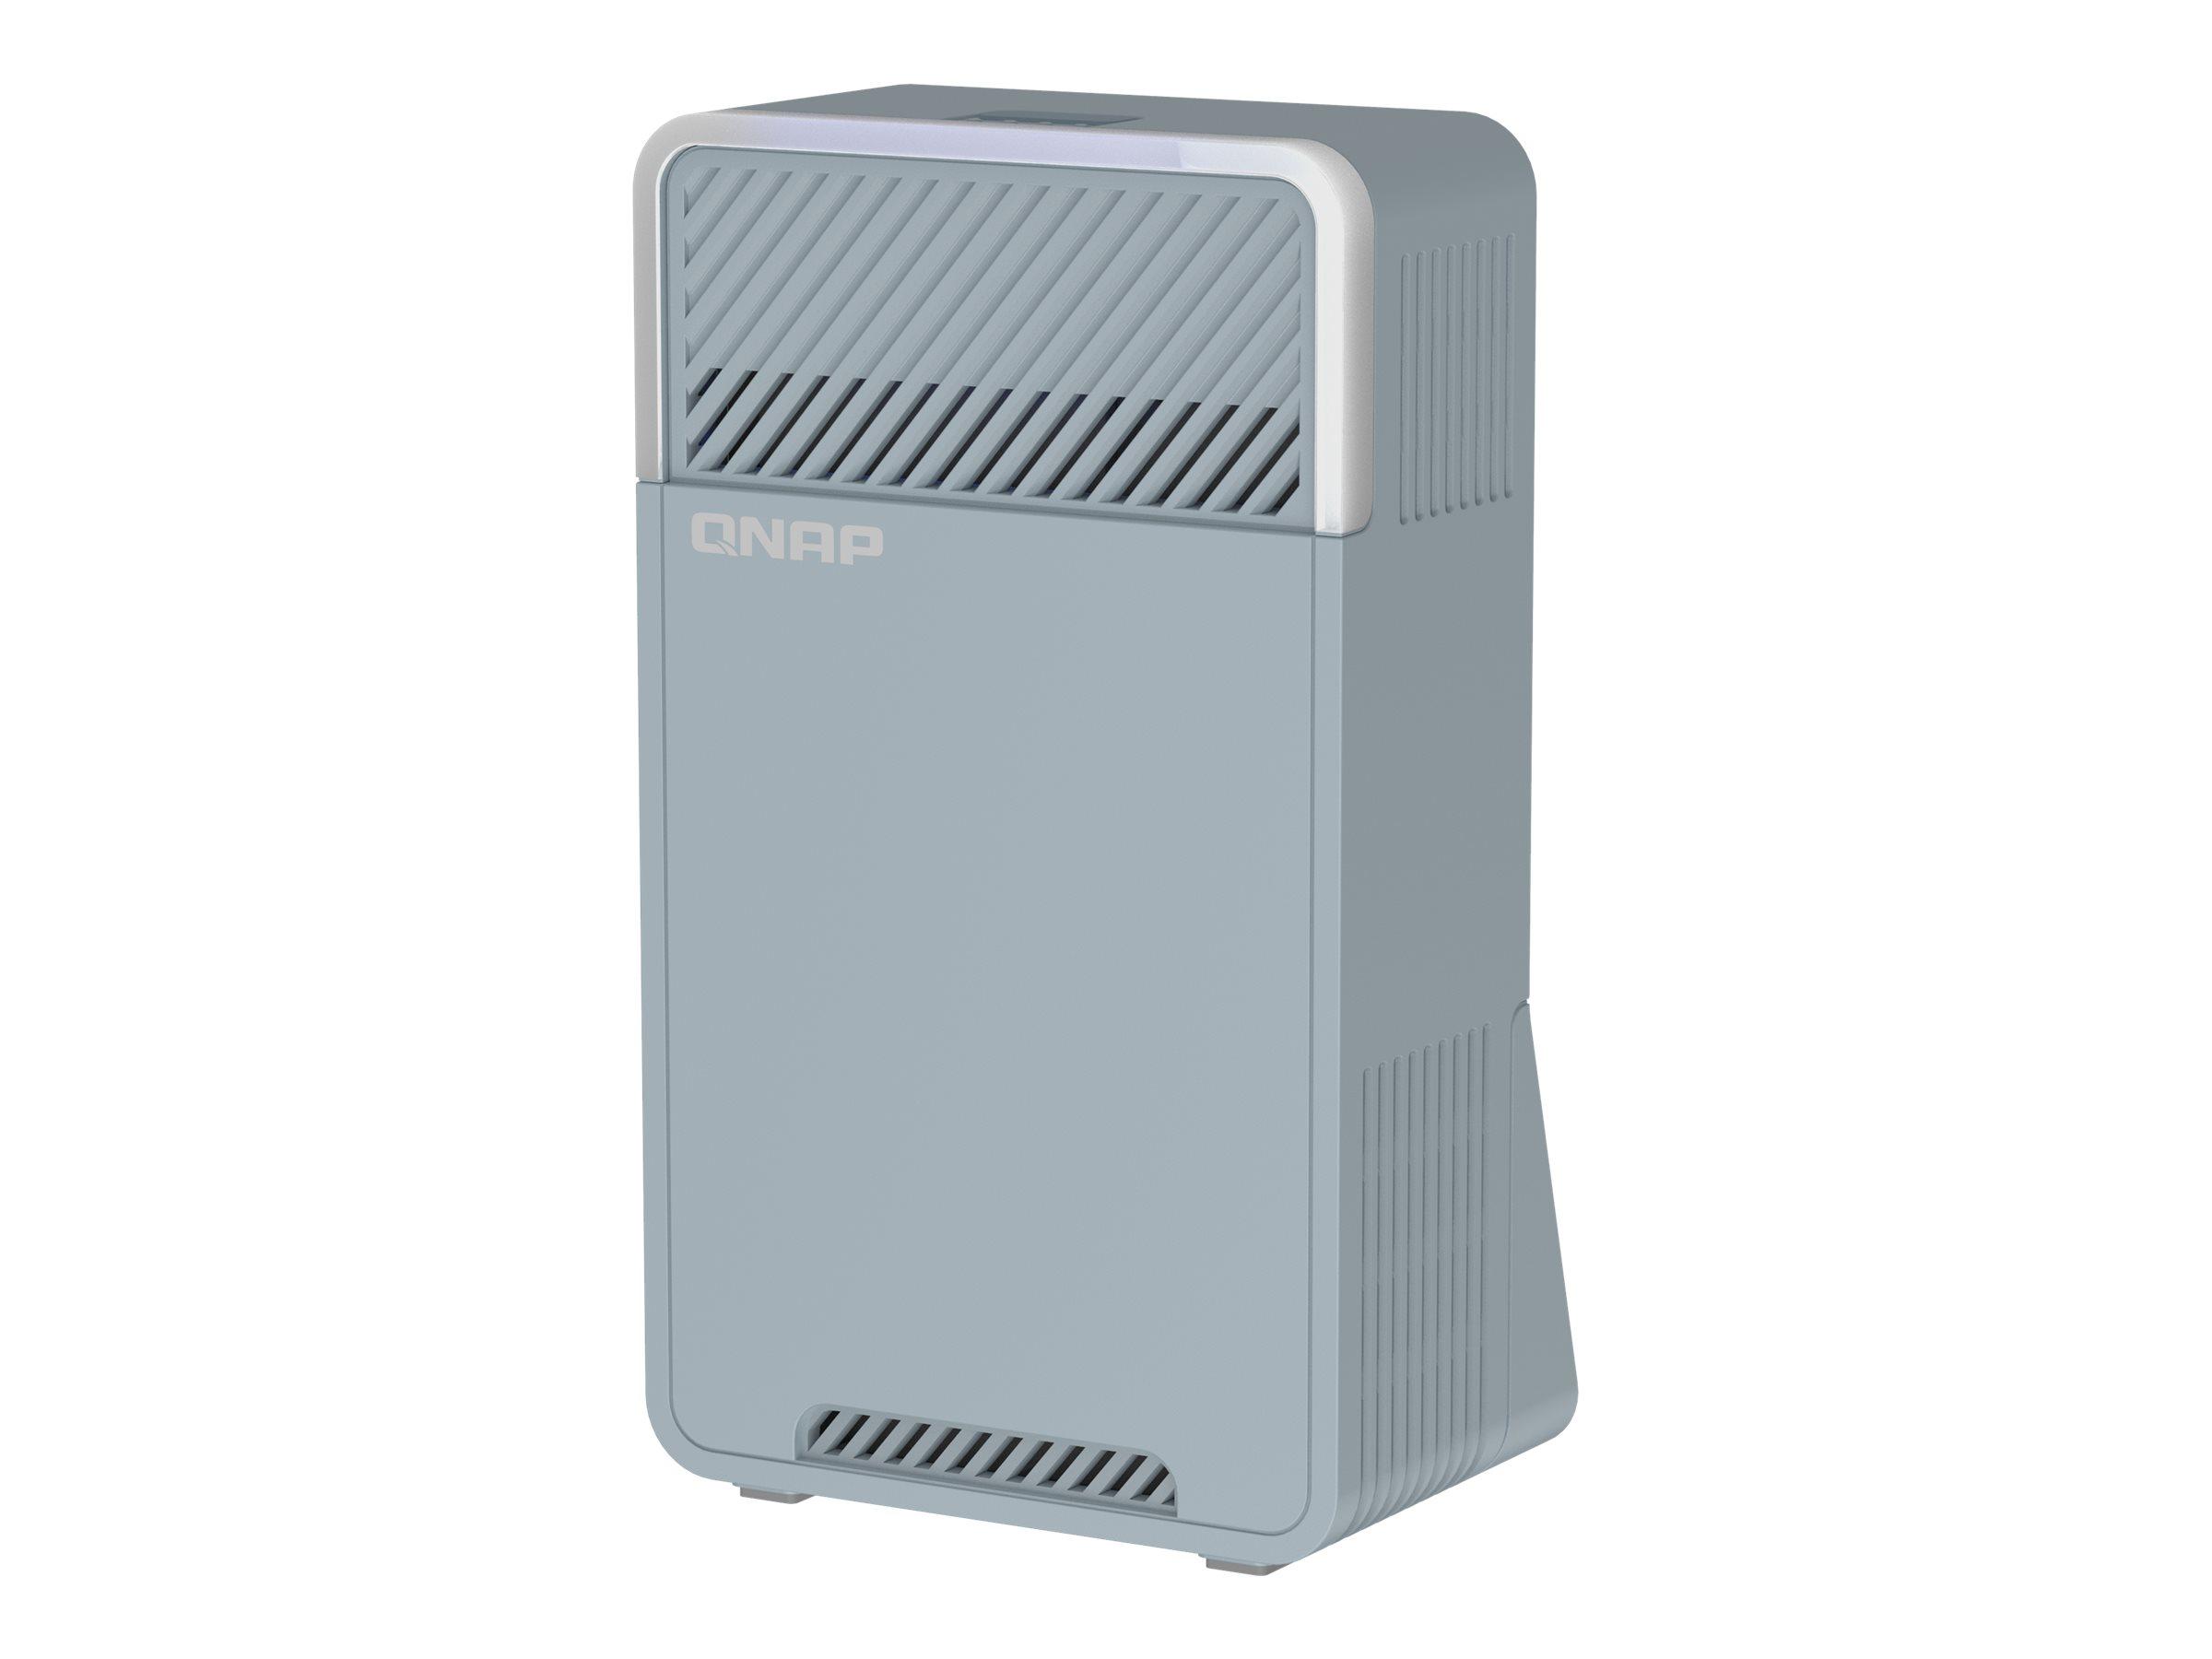 Vorschau: QNAP QMiro-201W - Wireless Router - GigE - 802.11a/b/g/n/ac, Bluetooth 5.0